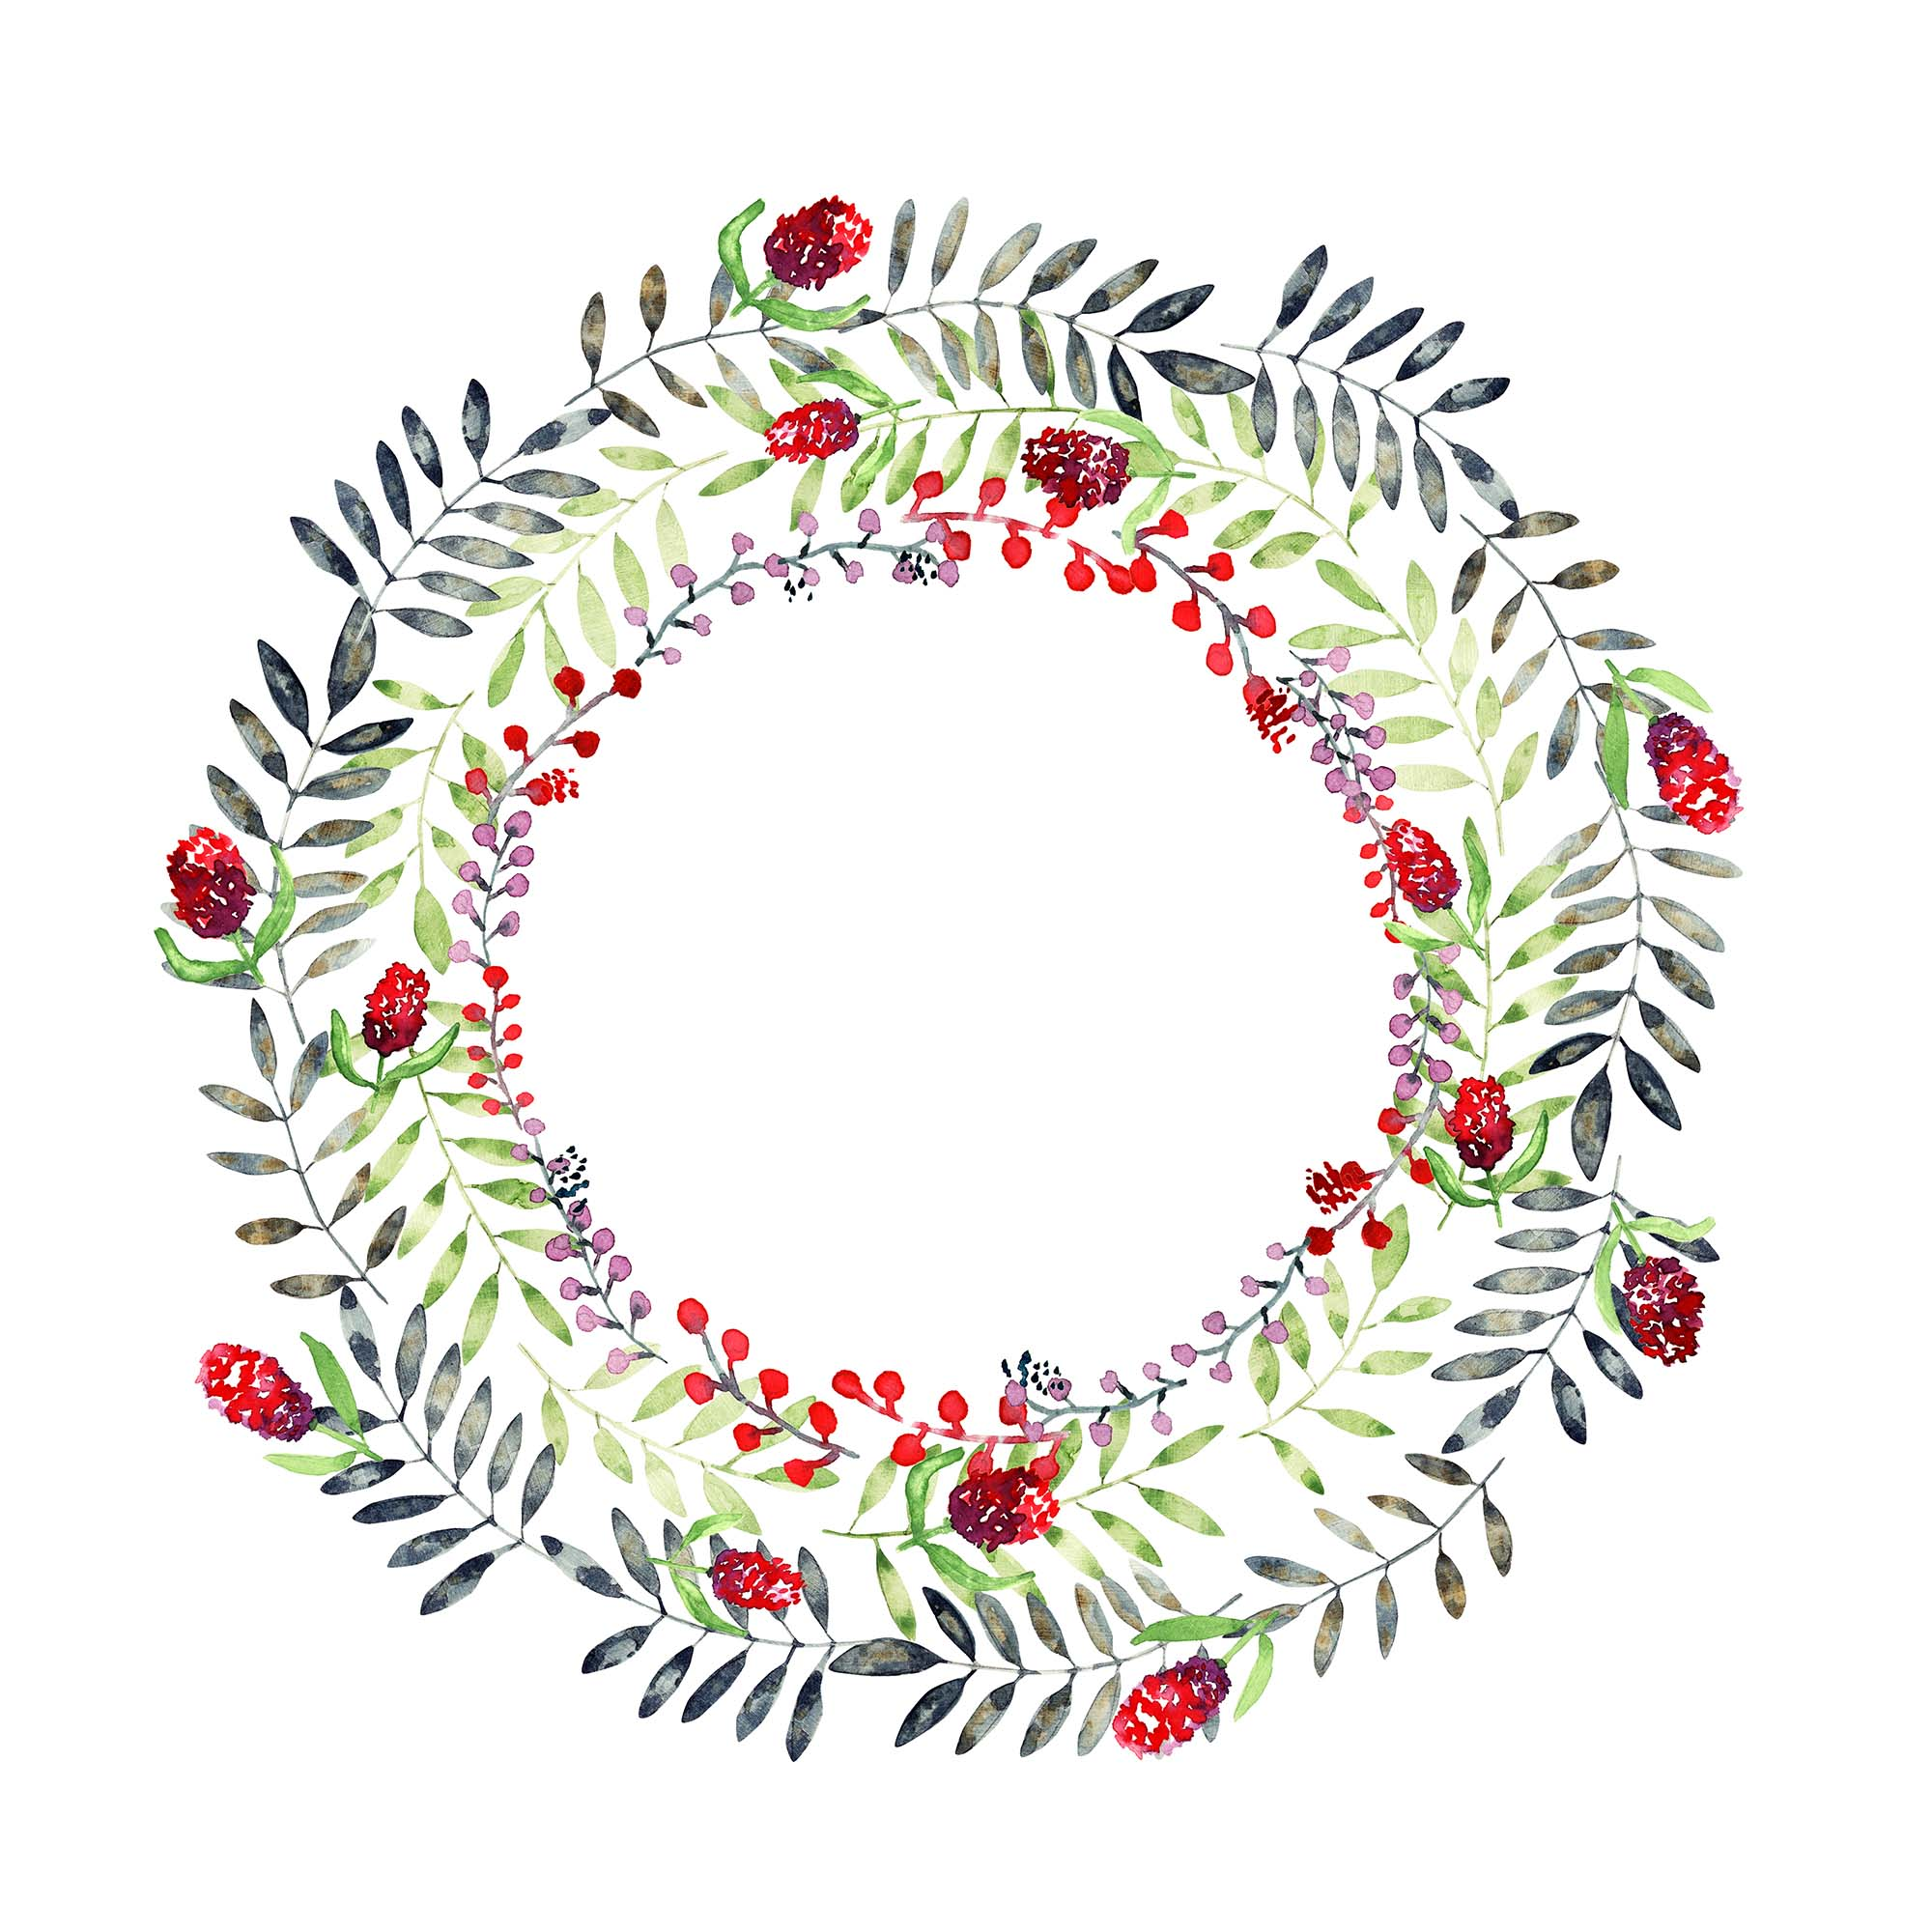 Watercolor Wreath Design